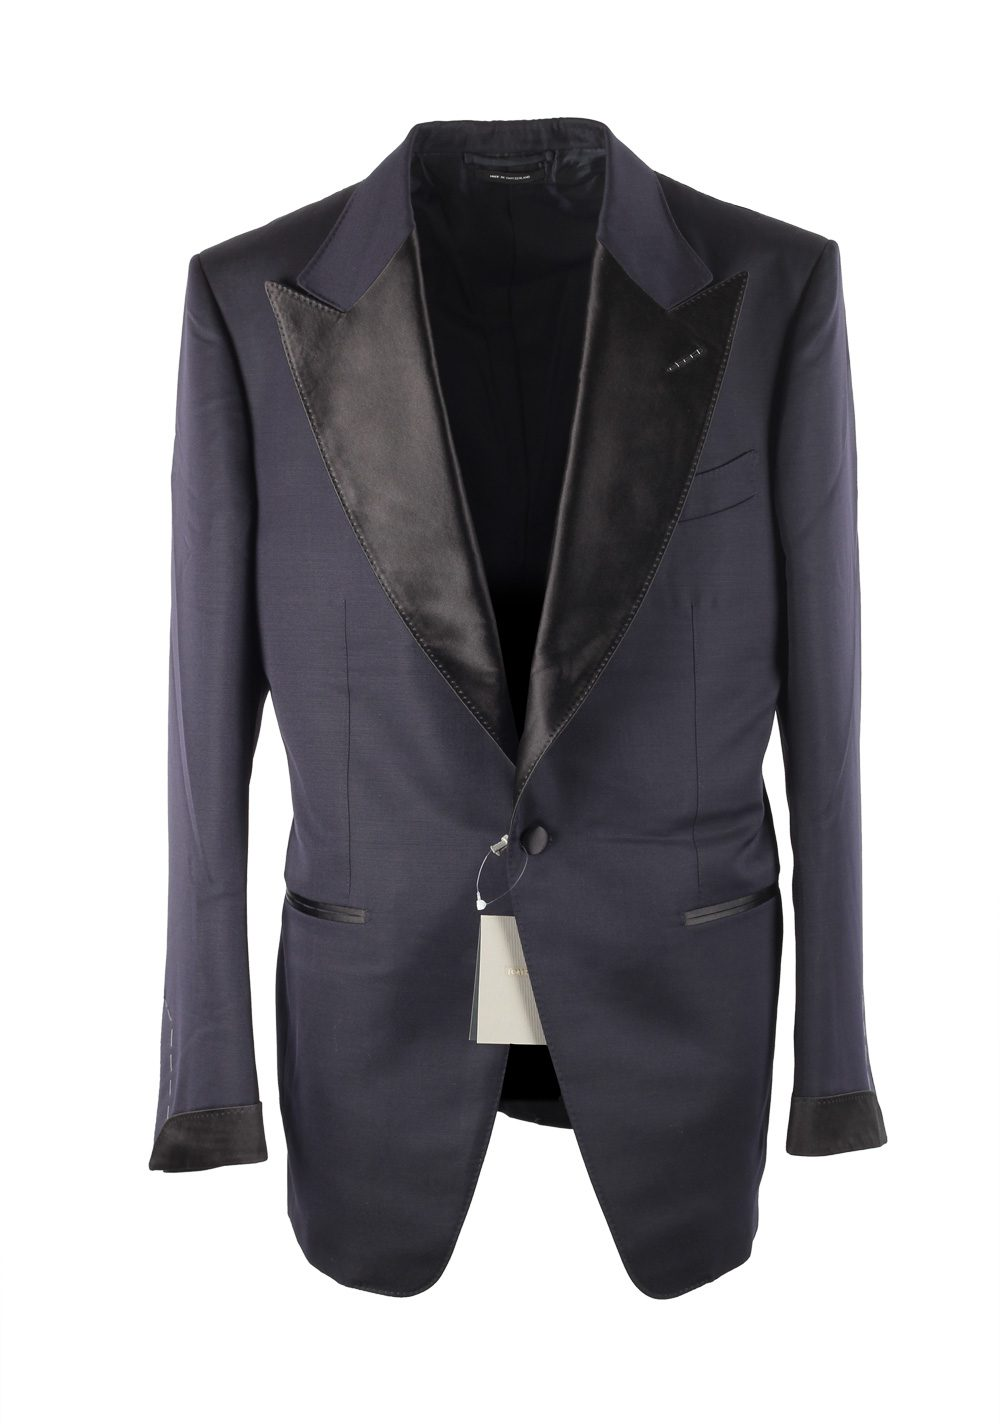 TOM FORD Atticus Midnight Blue Tuxedo Smoking Suit | Costume Limité